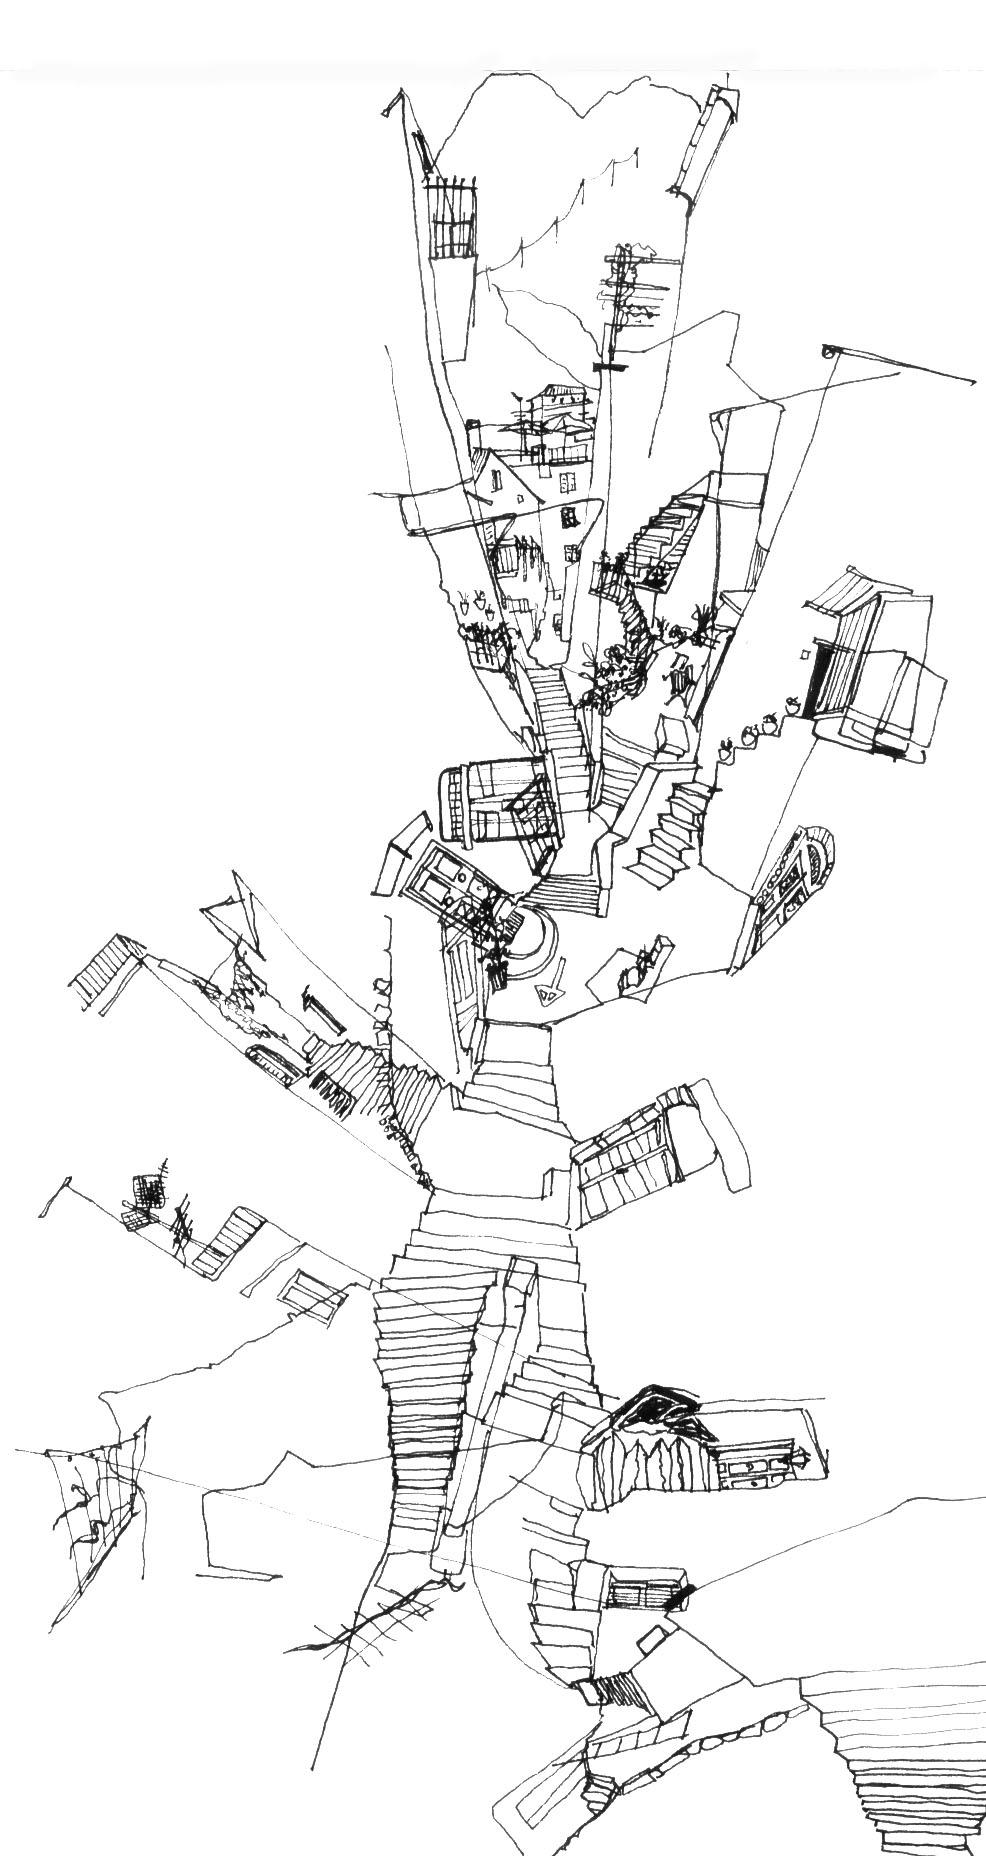 TOTC_K Sparenborg Brinton_Architectural Sketching Student_Cinque Terre Italy